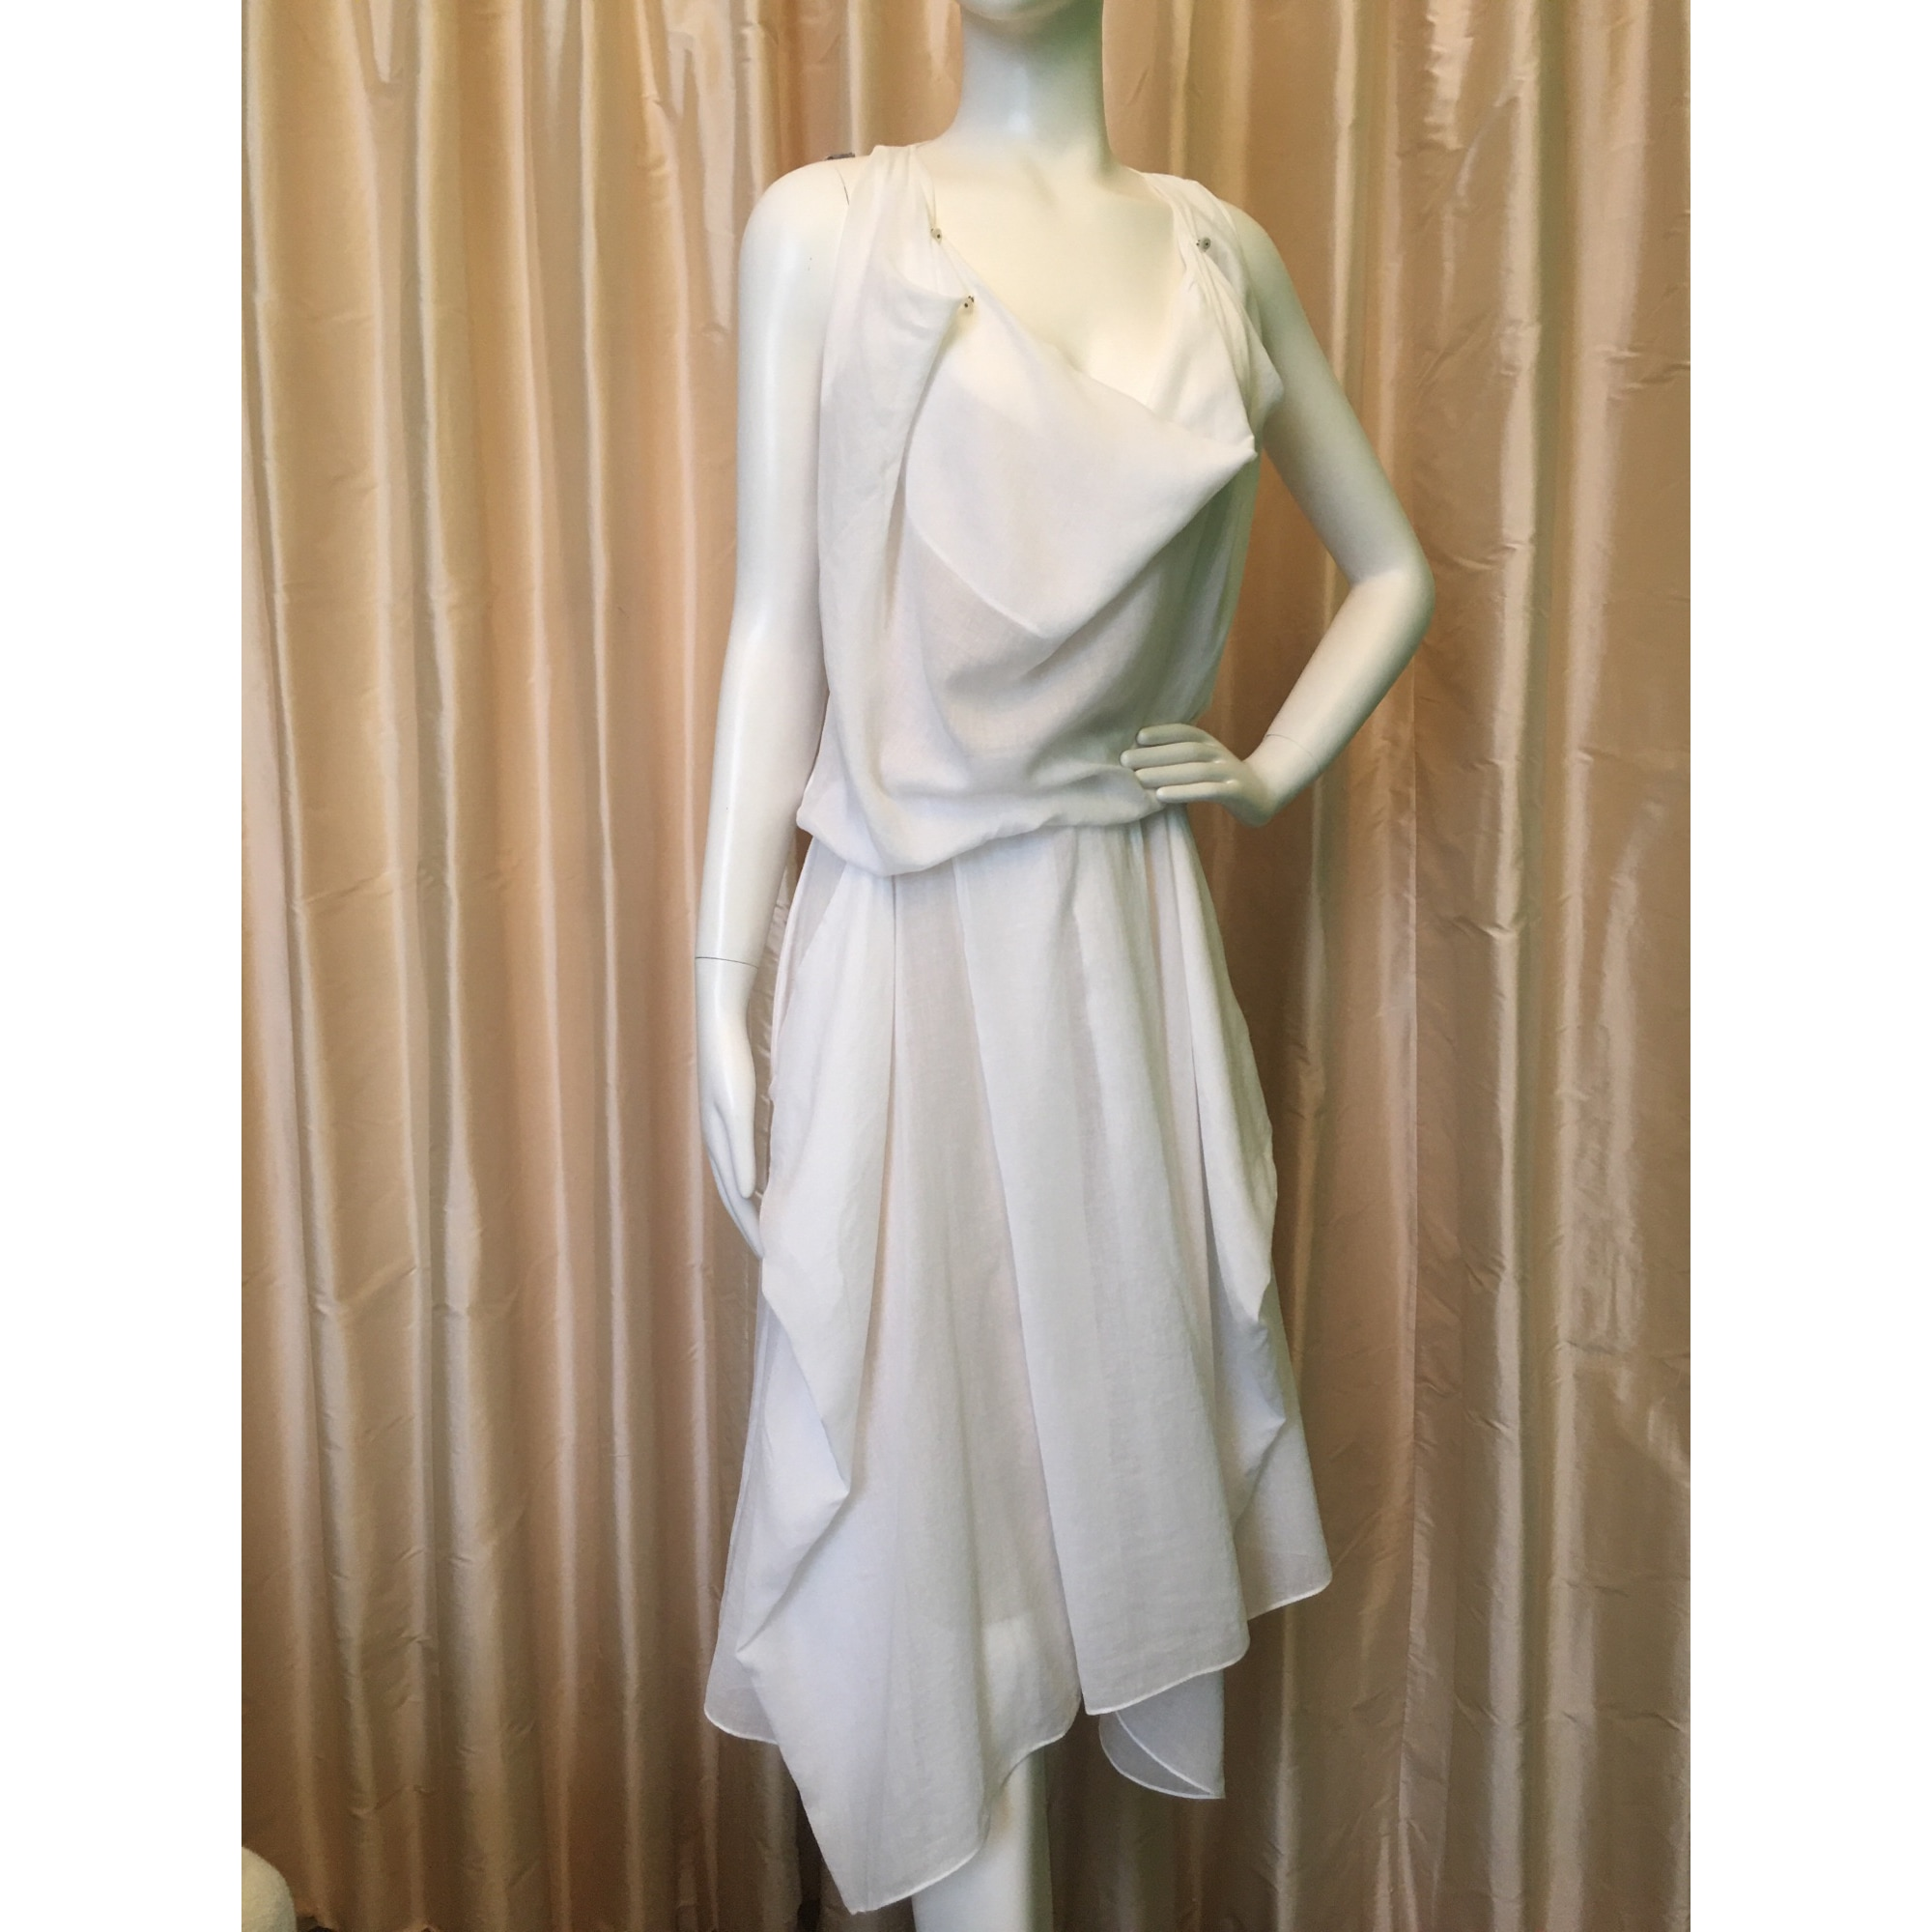 Robe mi-longue KENZO Blanc, blanc cassé, écru